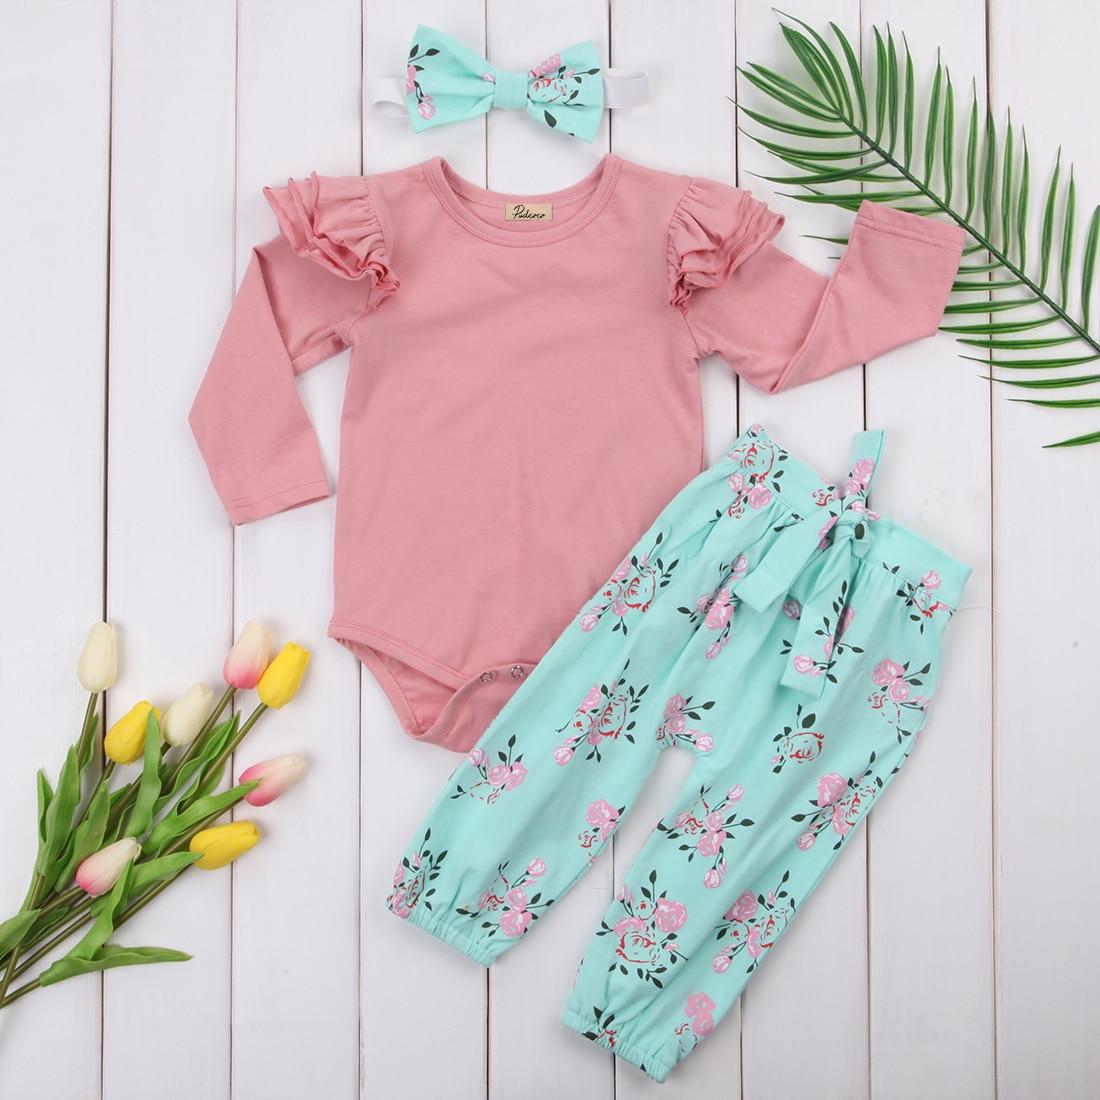 3Pcs Newborn Clothing Cotton Baby Girls Infant Floral Outfits Clothes Ruffles Long Sleeve Bodysuit+Long Pants Kids Clothing Set